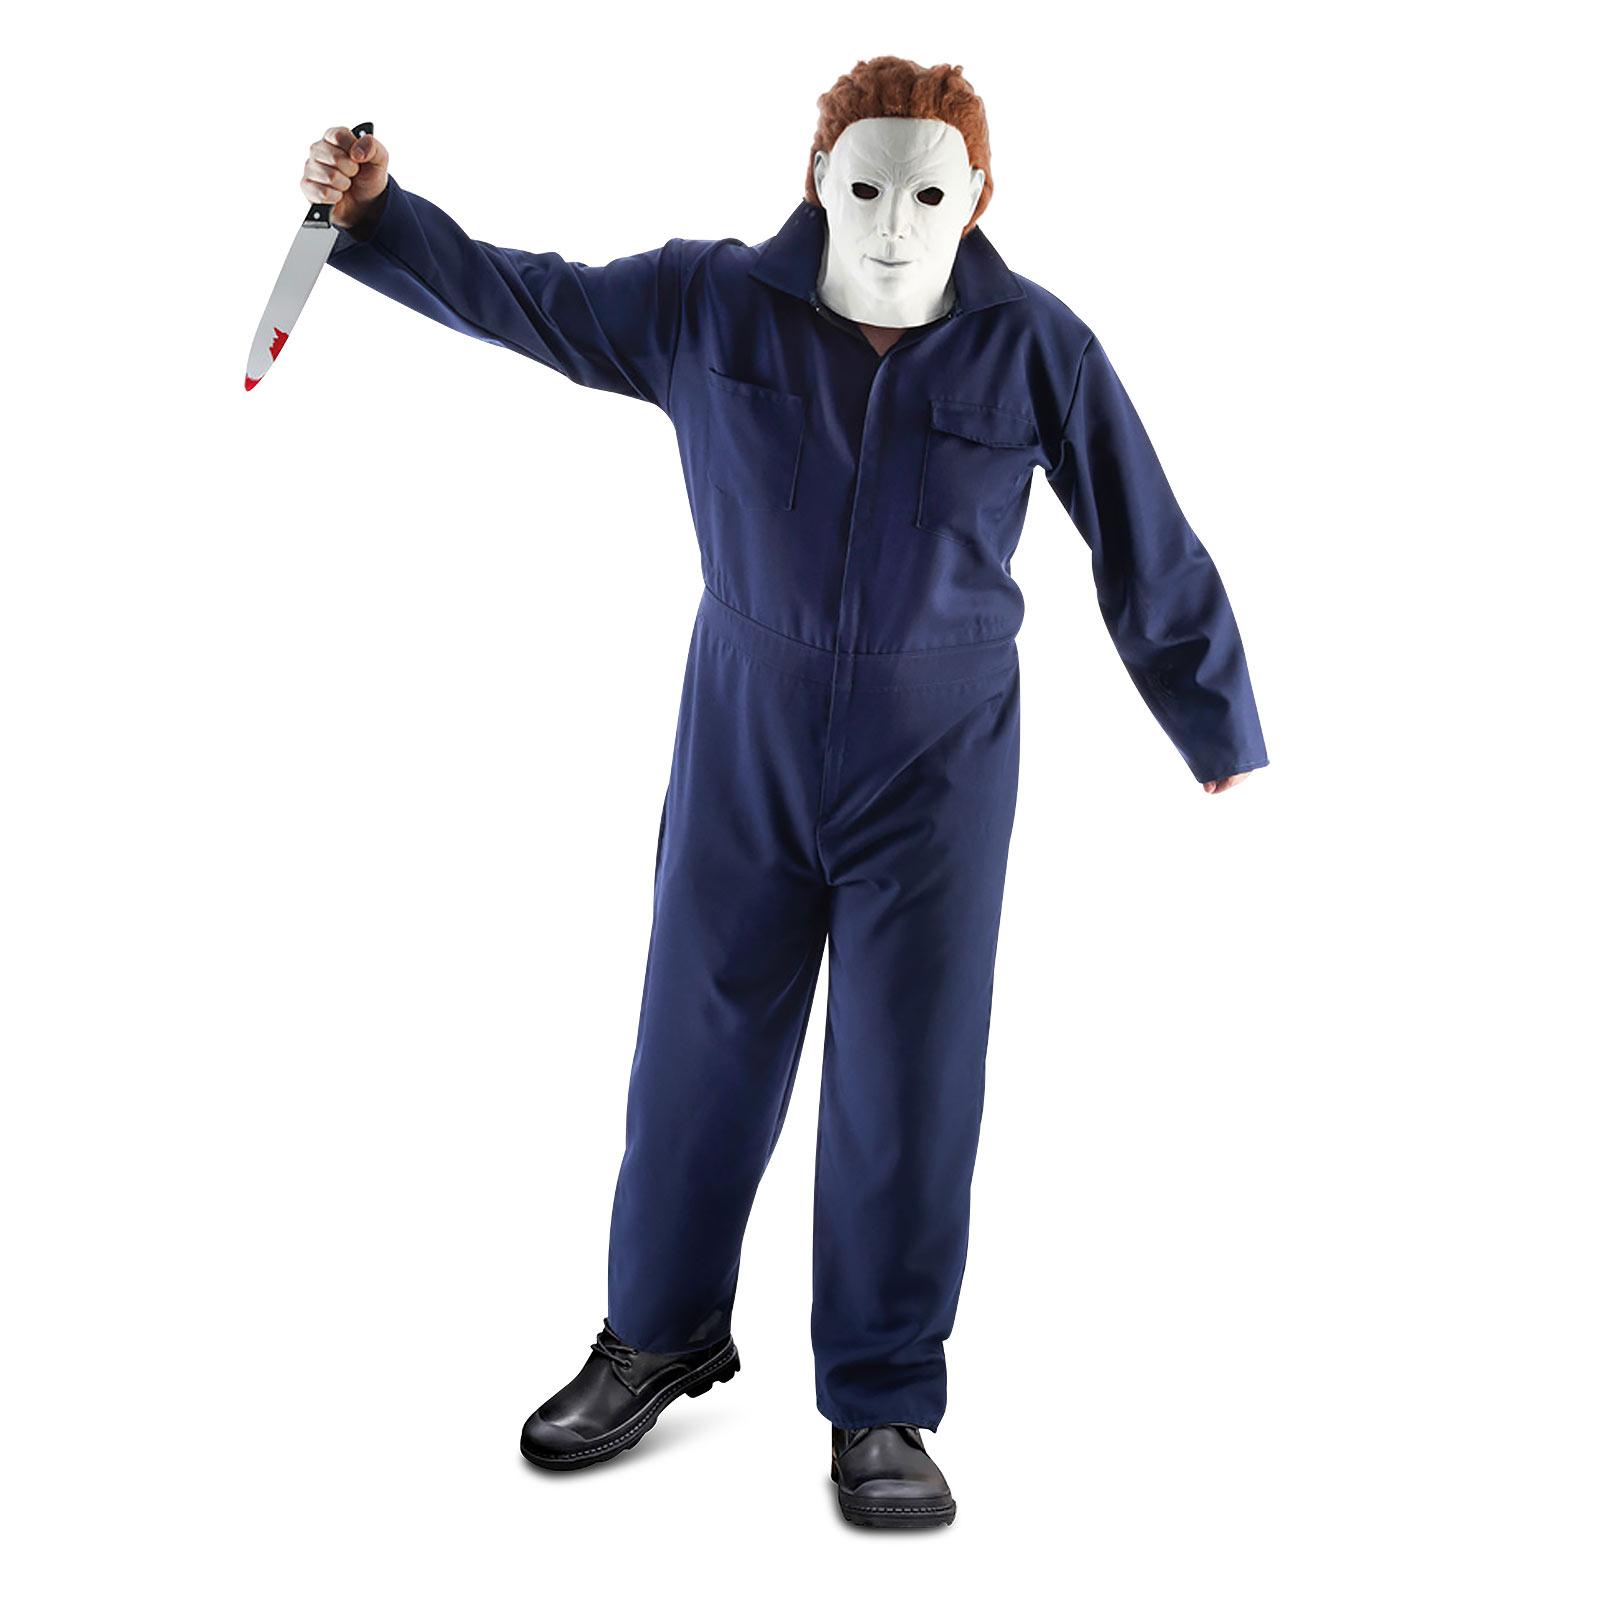 Michael Kostüm Overall für Halloween Fans